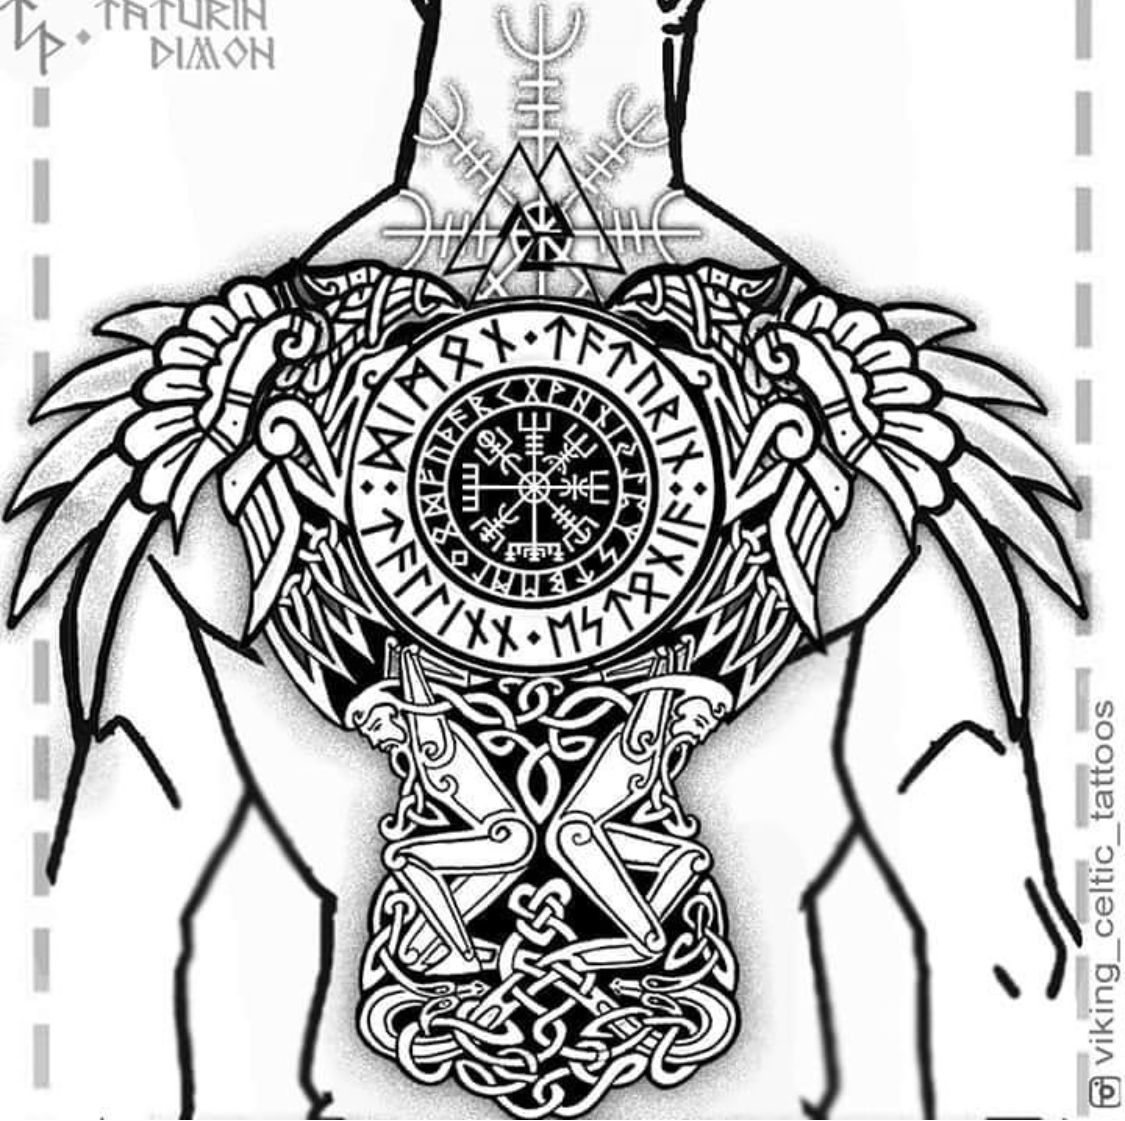 Tattoo Sleeve Generator: Pin By Joseph On Tattoo Ideas